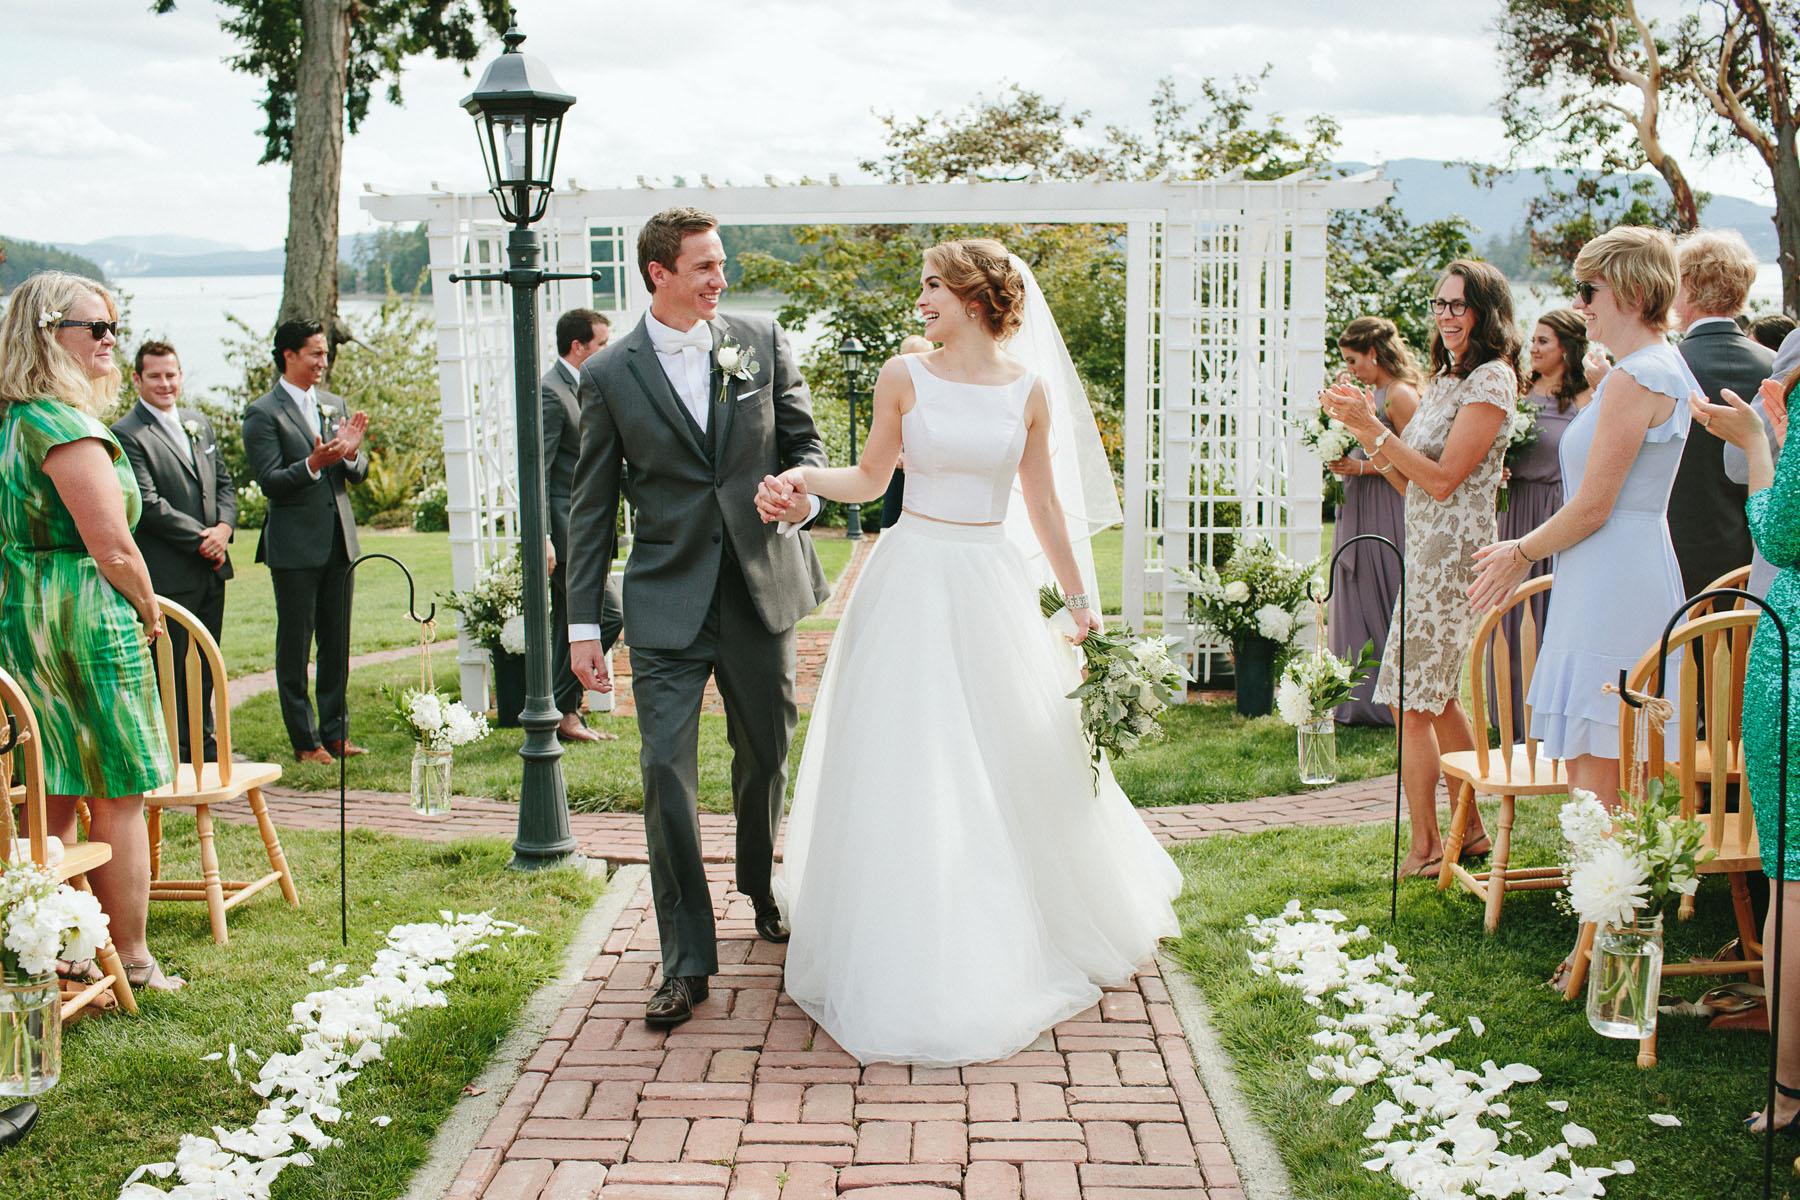 thetis-island-wedding-photographer-rp-rn-101.jpg